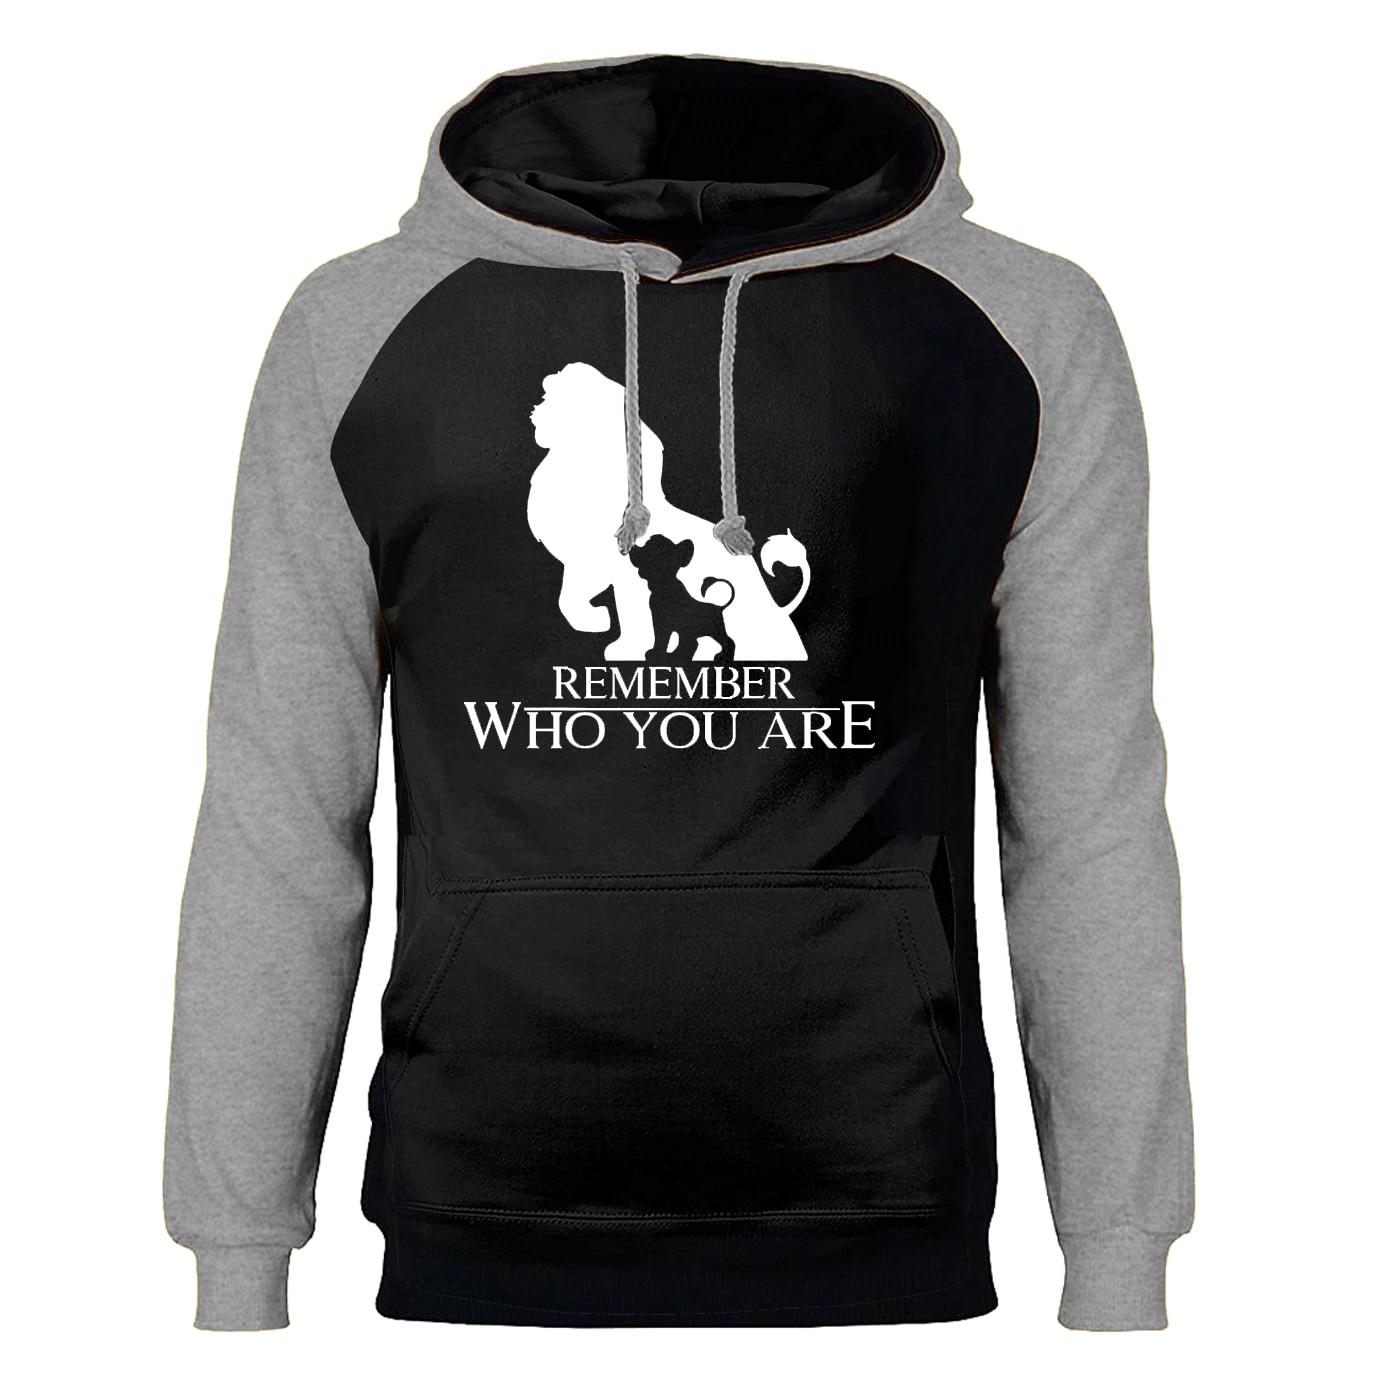 The Lion King Hoodies Men Remember Who You Are Simba Raglan Hooded Sweatshirts Winter Autumn Fleece Warm Cartoon Sportswear Mens